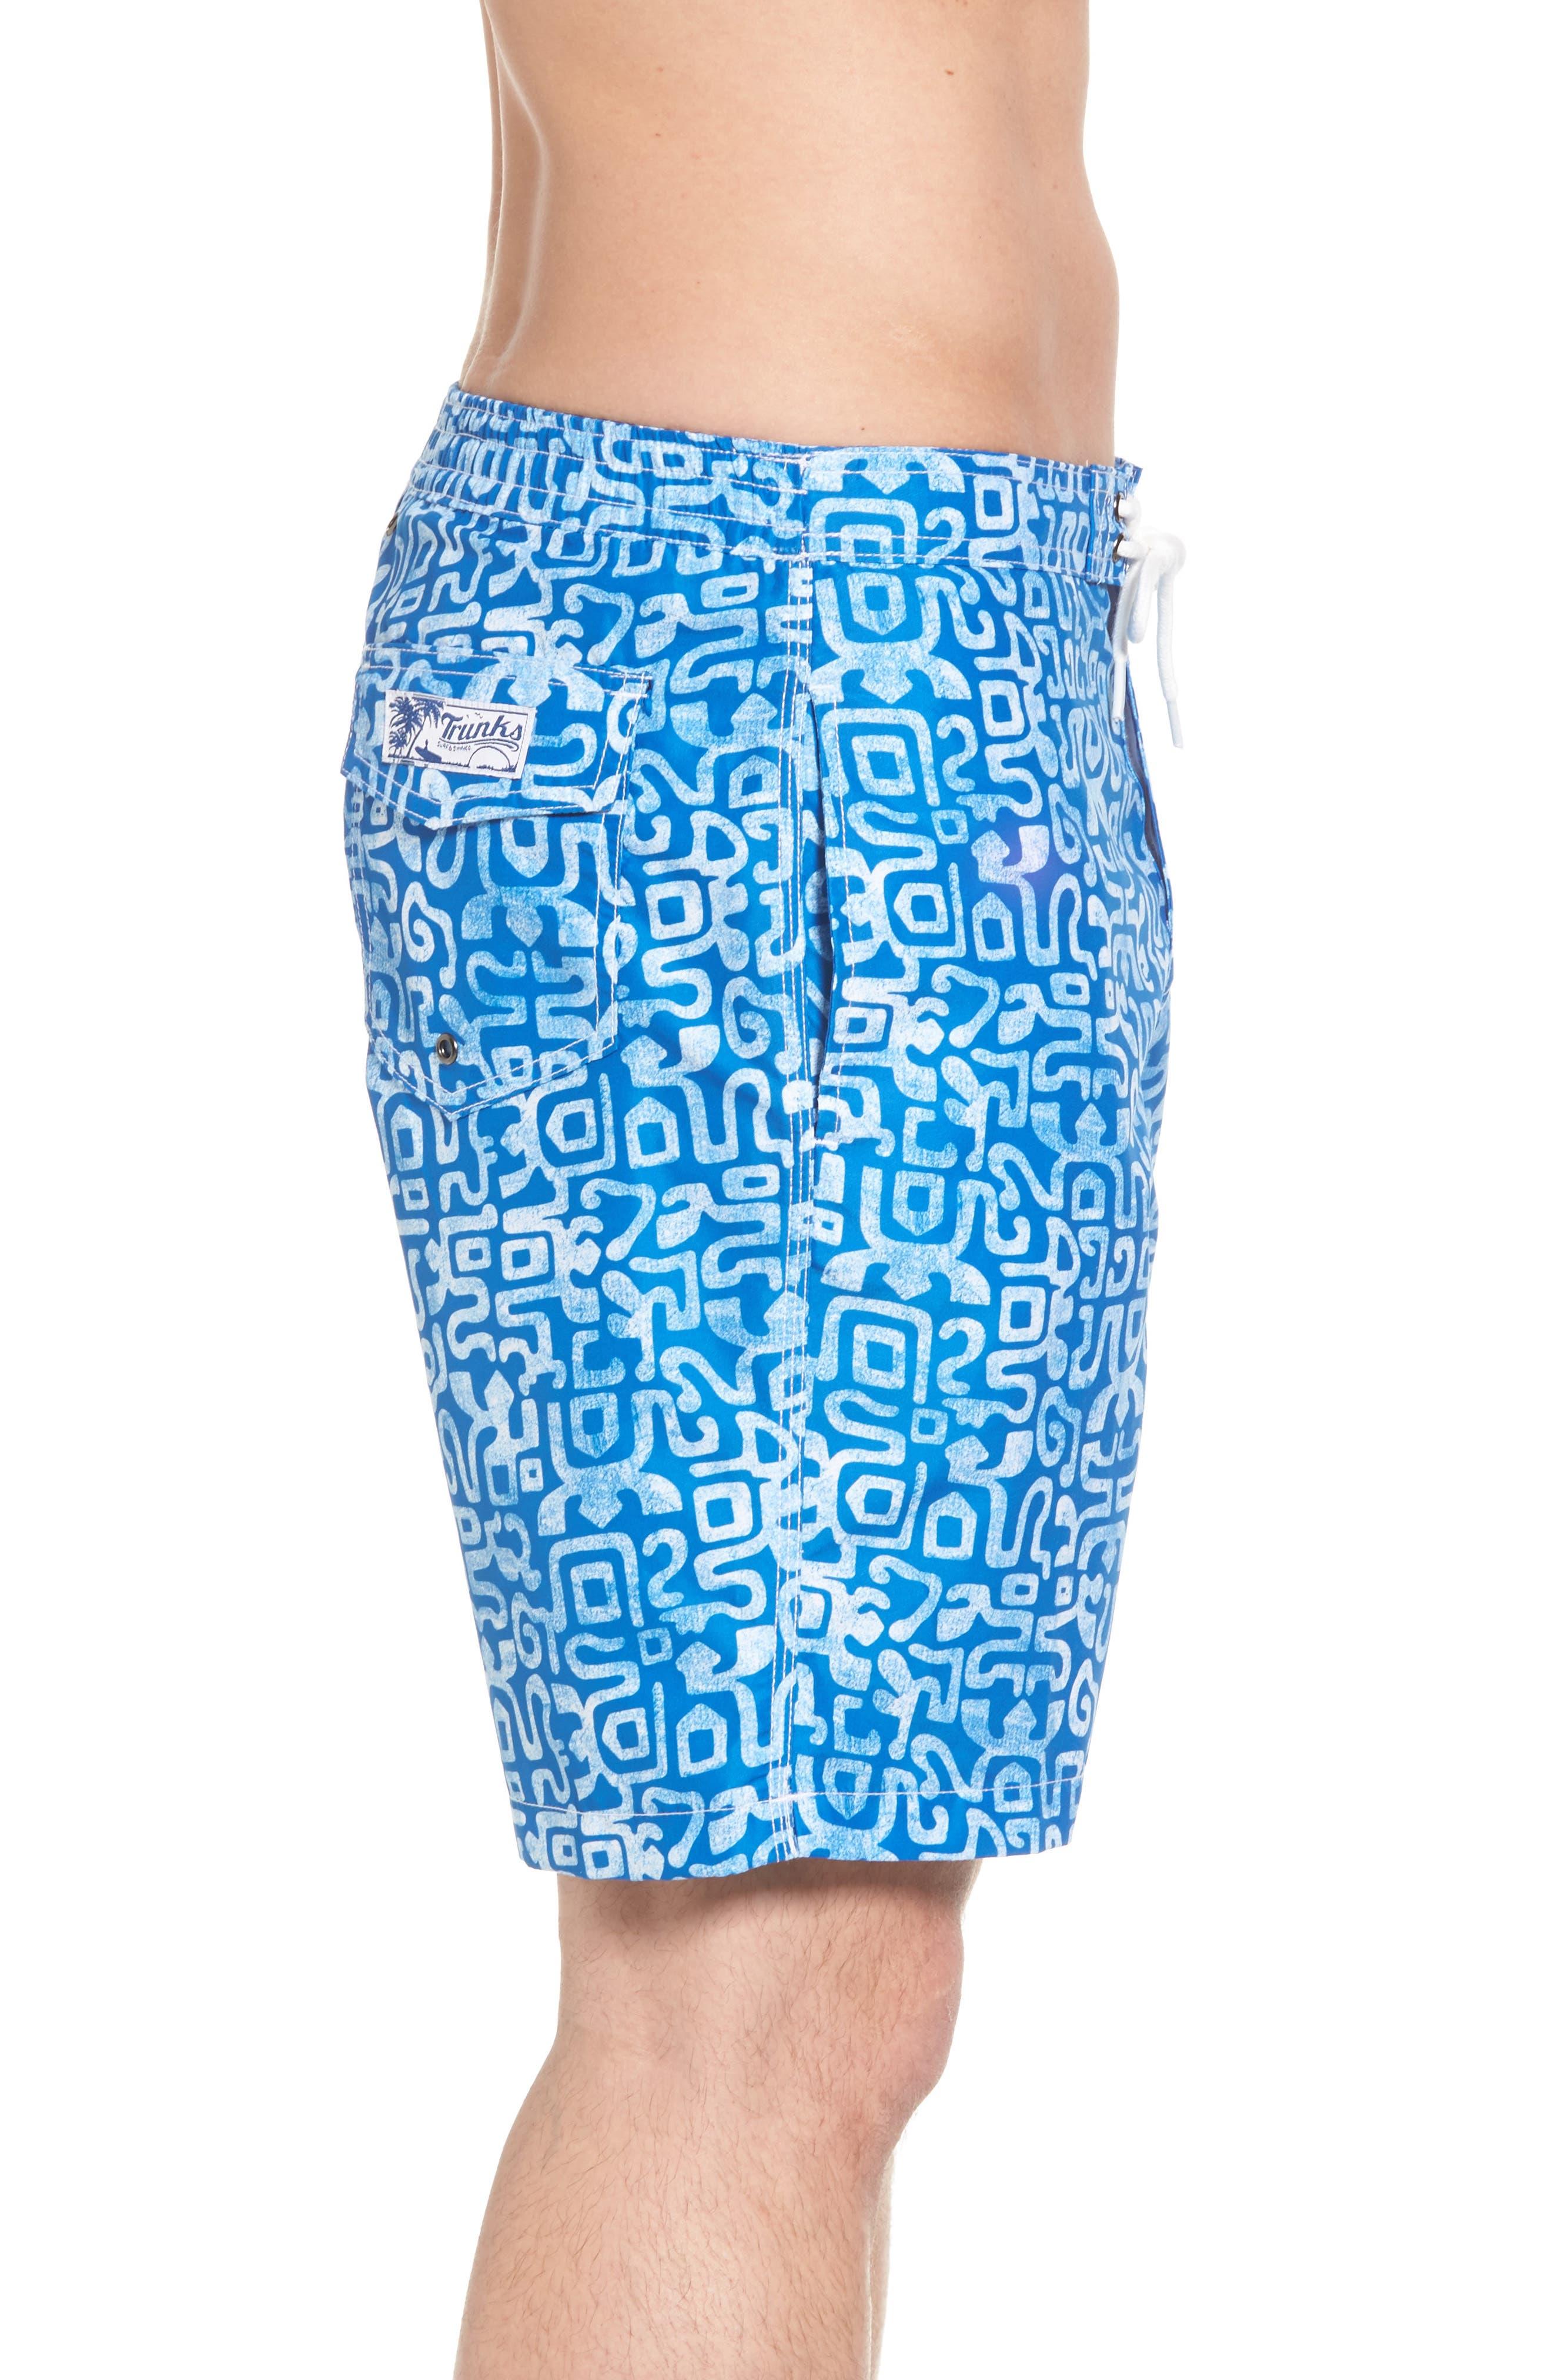 Trunks Swim & Surf CO. Swami Geo Print Board Shorts,                             Alternate thumbnail 3, color,                             Nautical Blue/ White